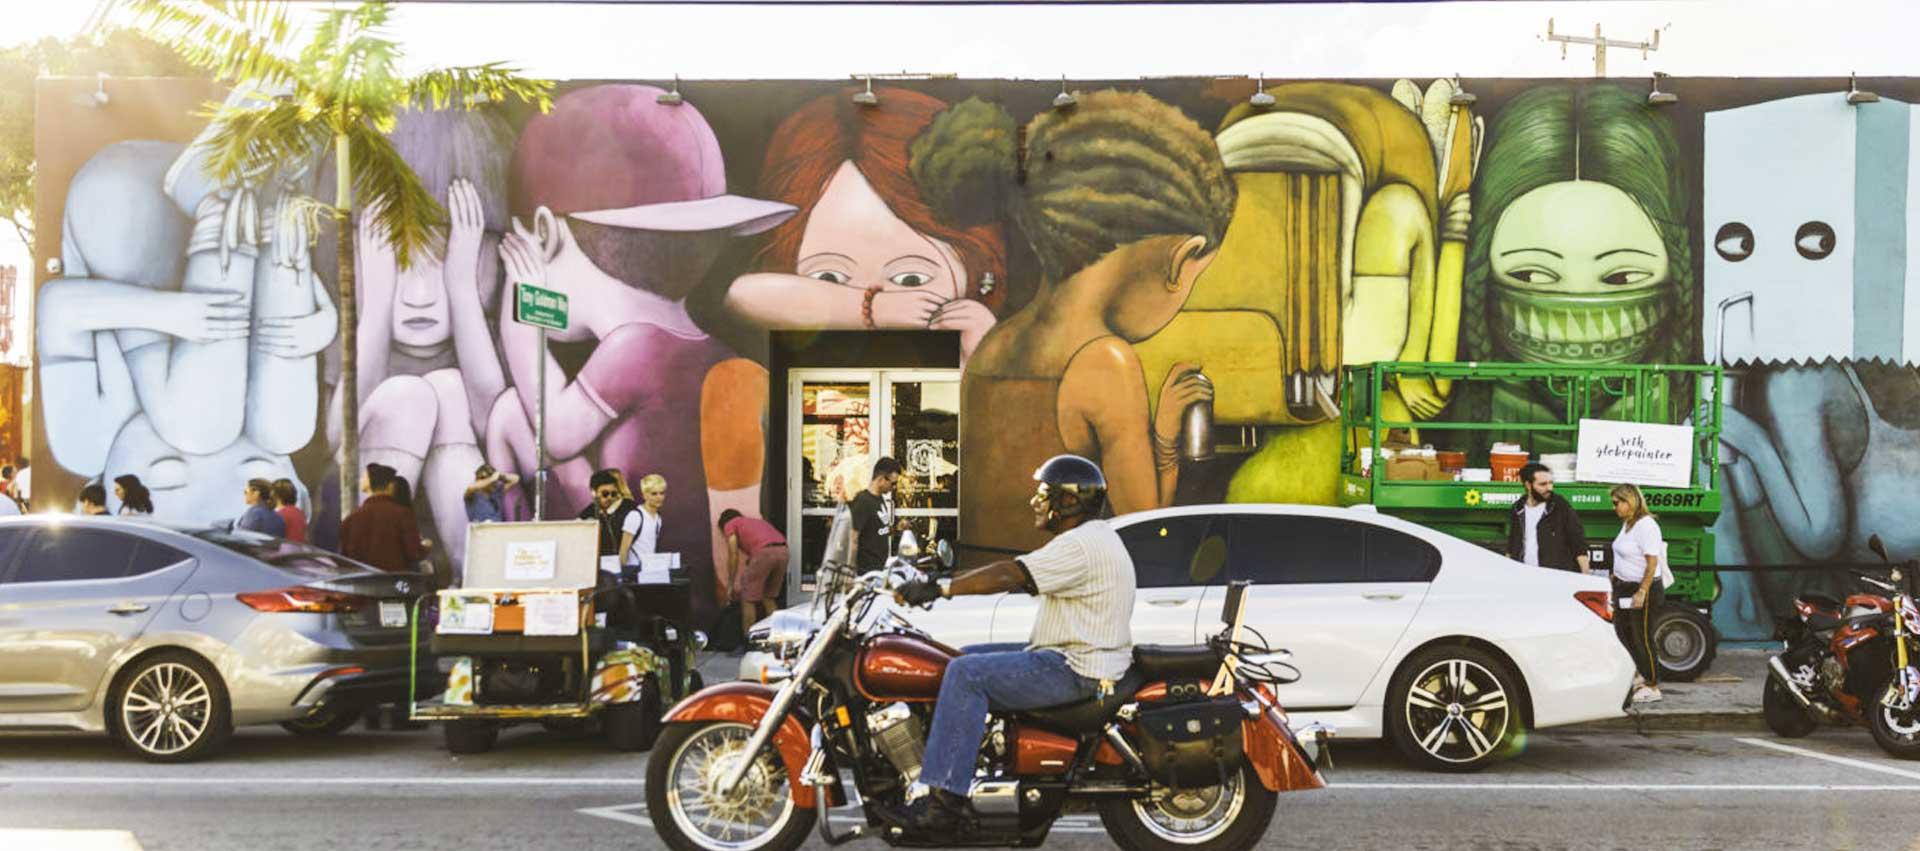 Street-Art-Blog-Banner07